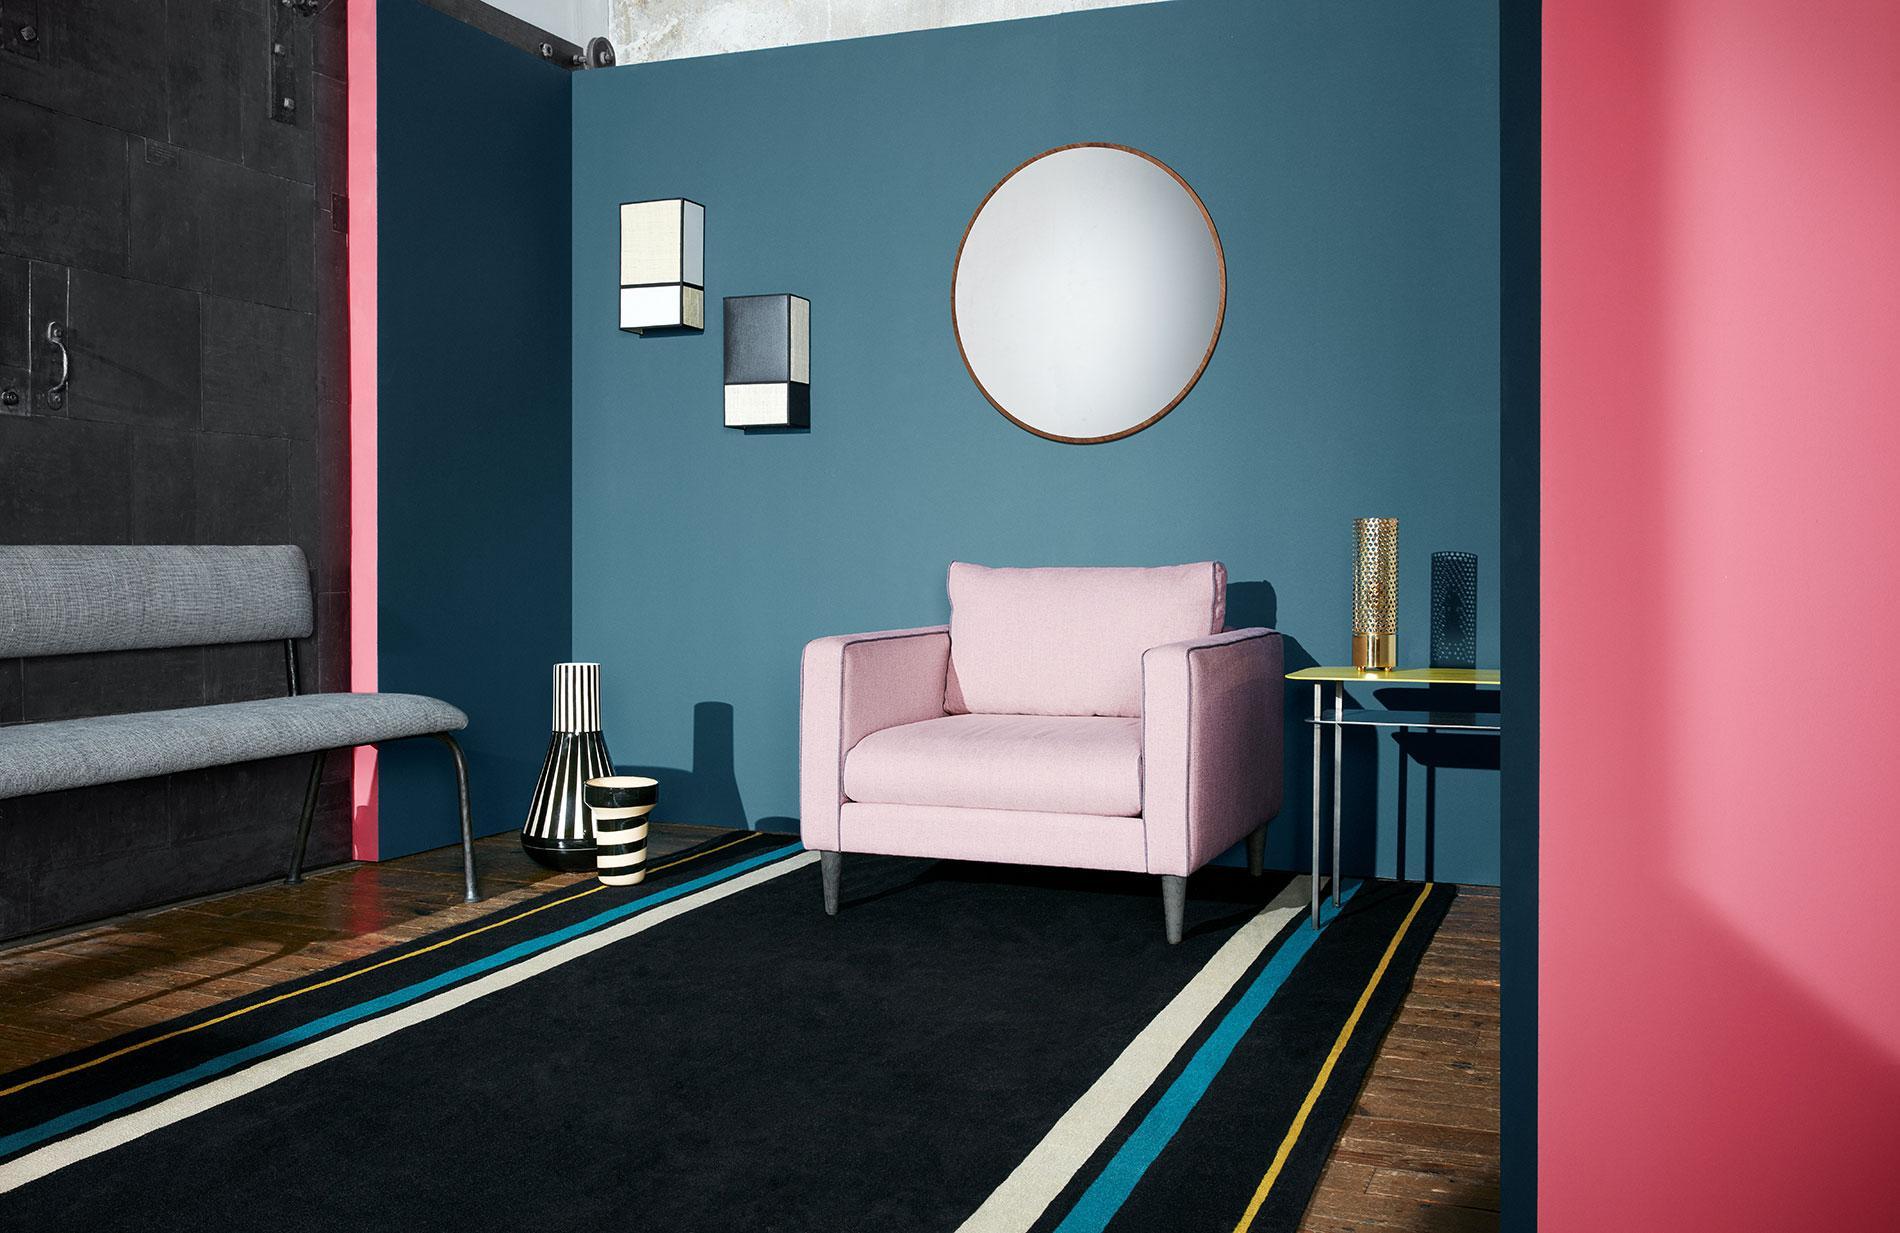 sp cial d co avec sarah lavoine dito coulisses et interview vid o madame figaro. Black Bedroom Furniture Sets. Home Design Ideas